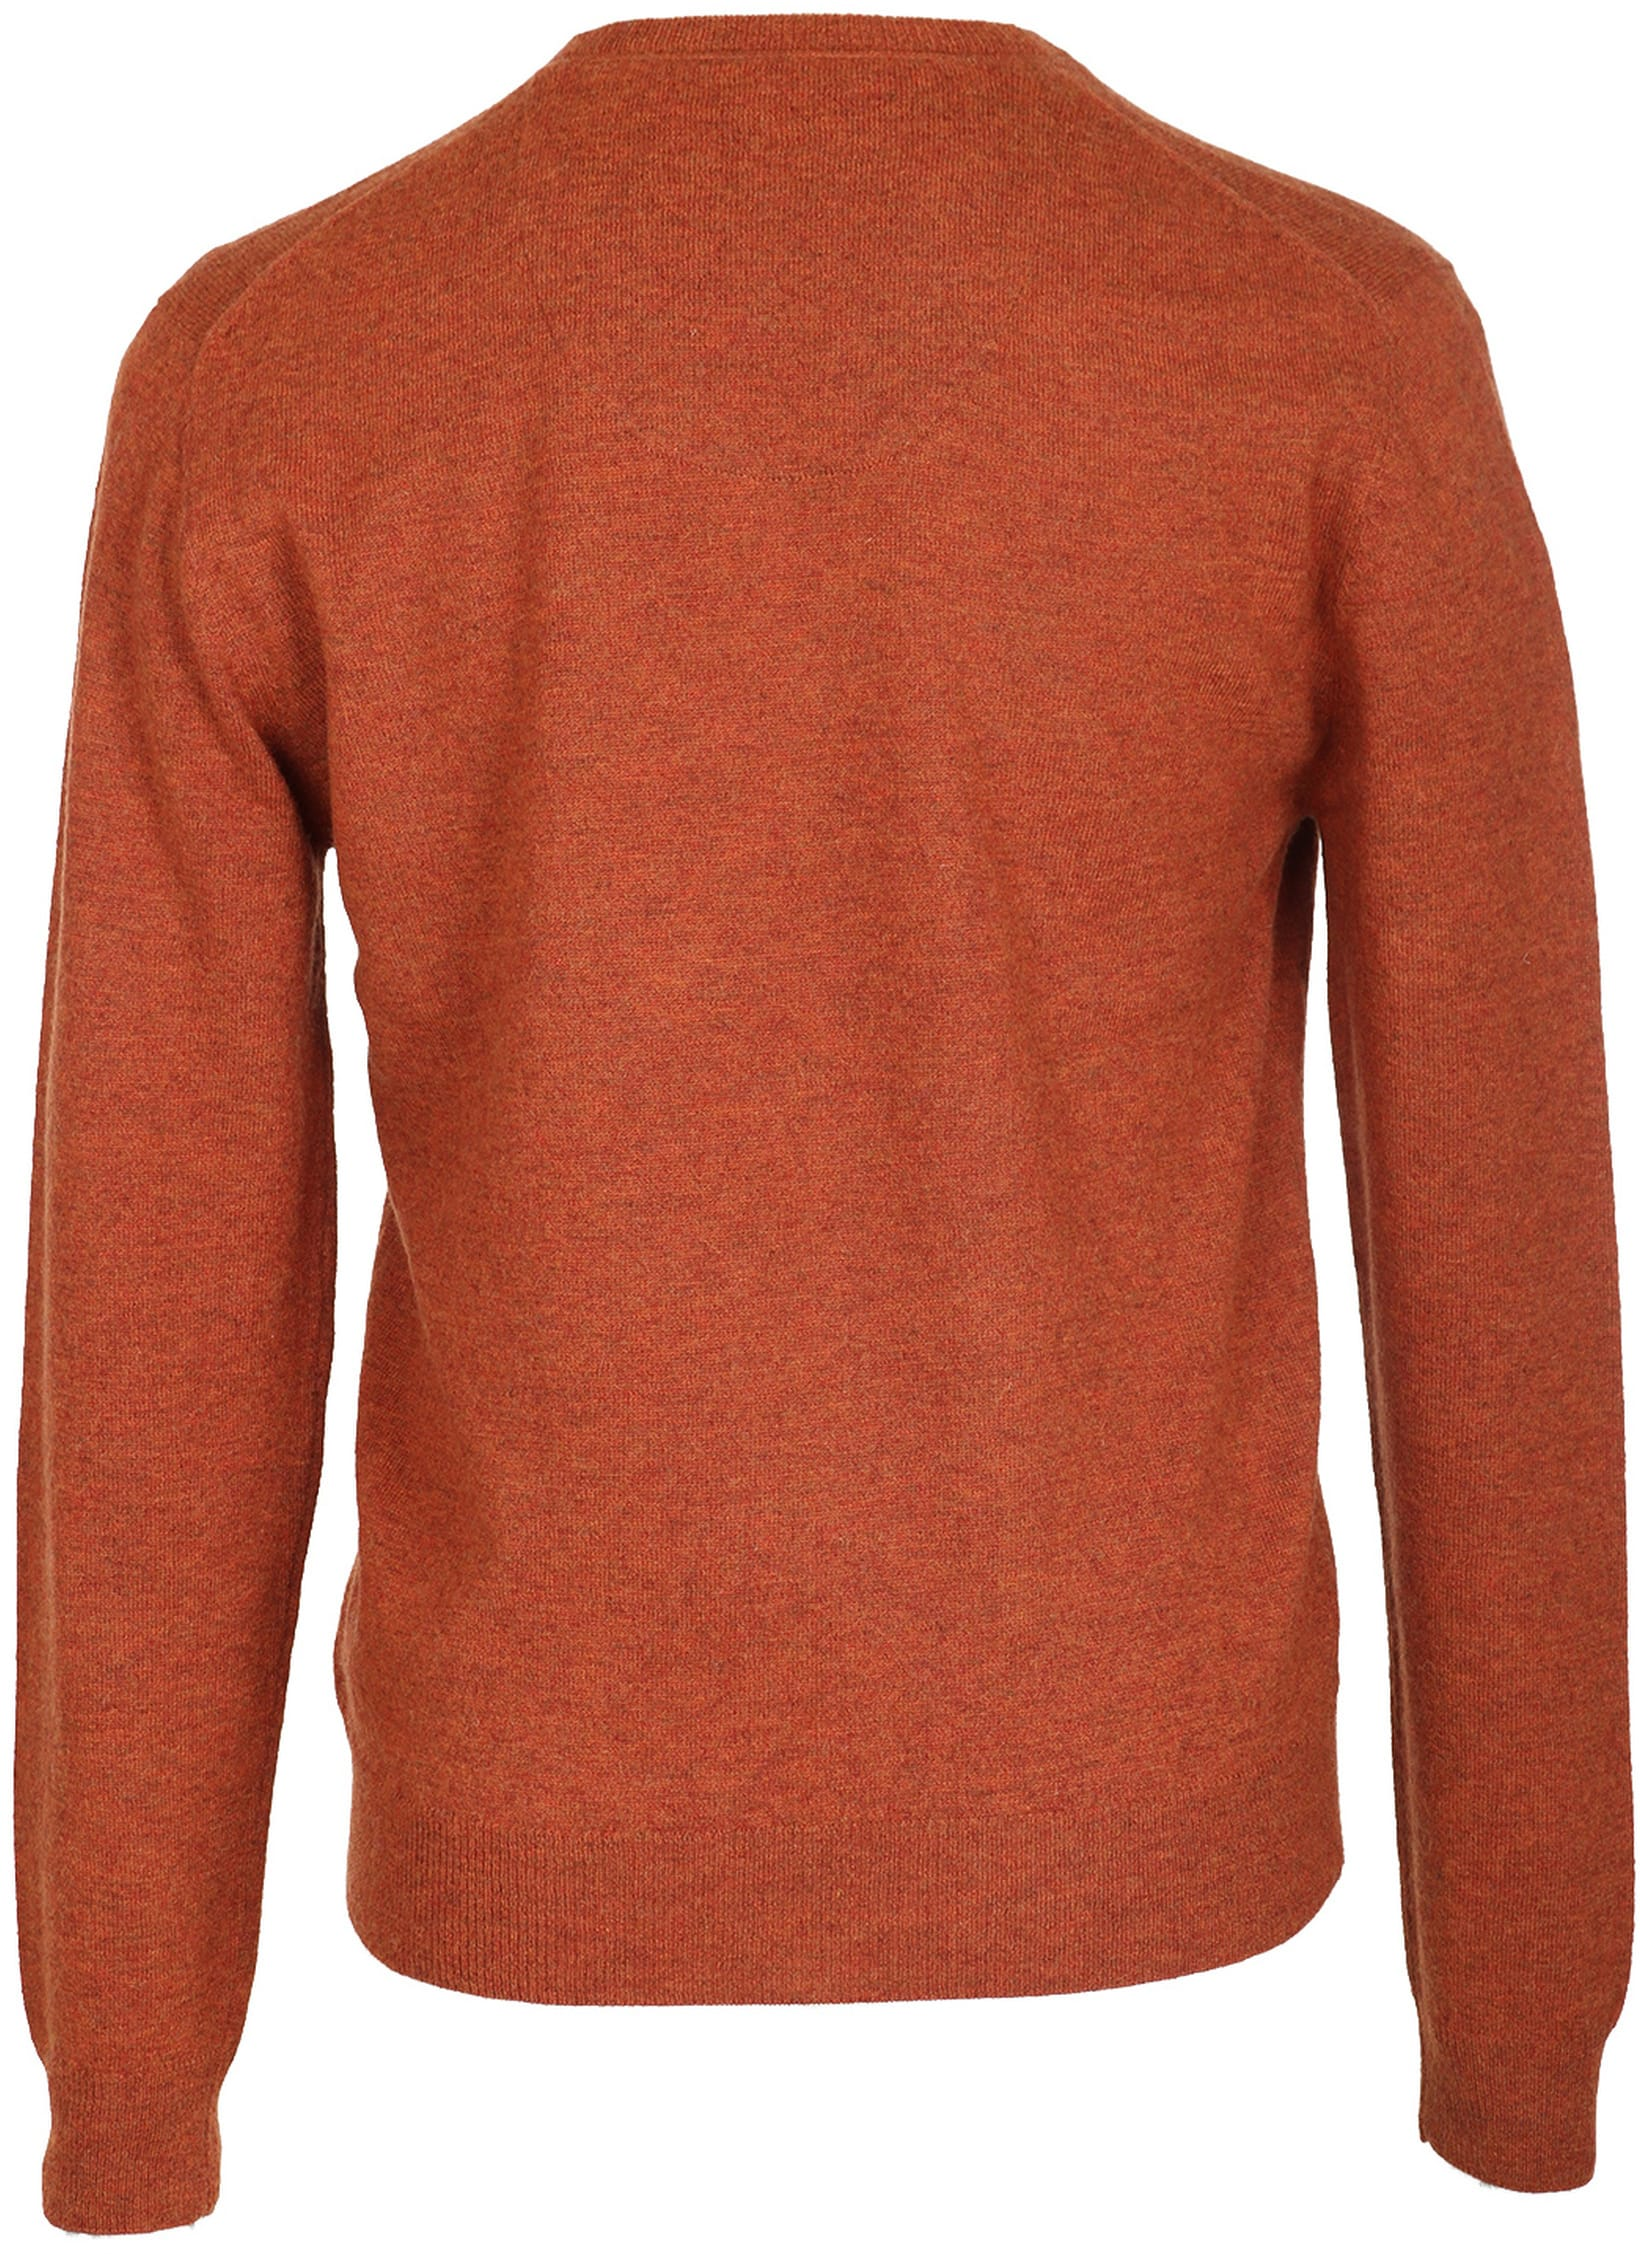 Suitable Pullover Lamswol Oranje foto 1